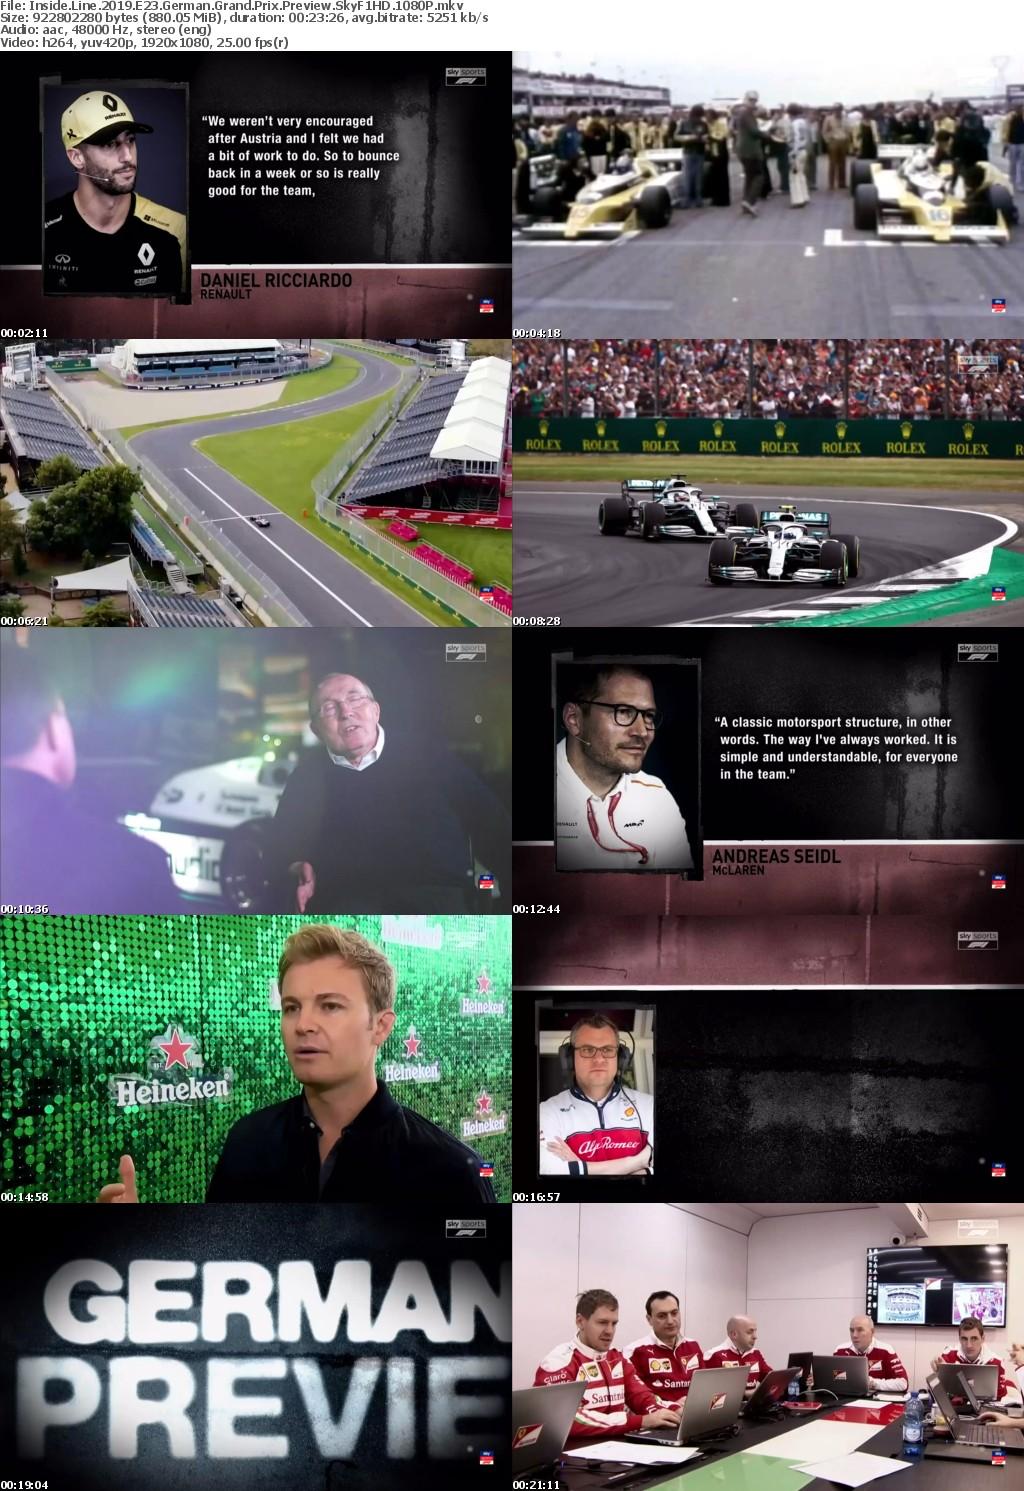 Inside Line 2019 E23 German Grand Prix Preview SkyF1HD 1080P